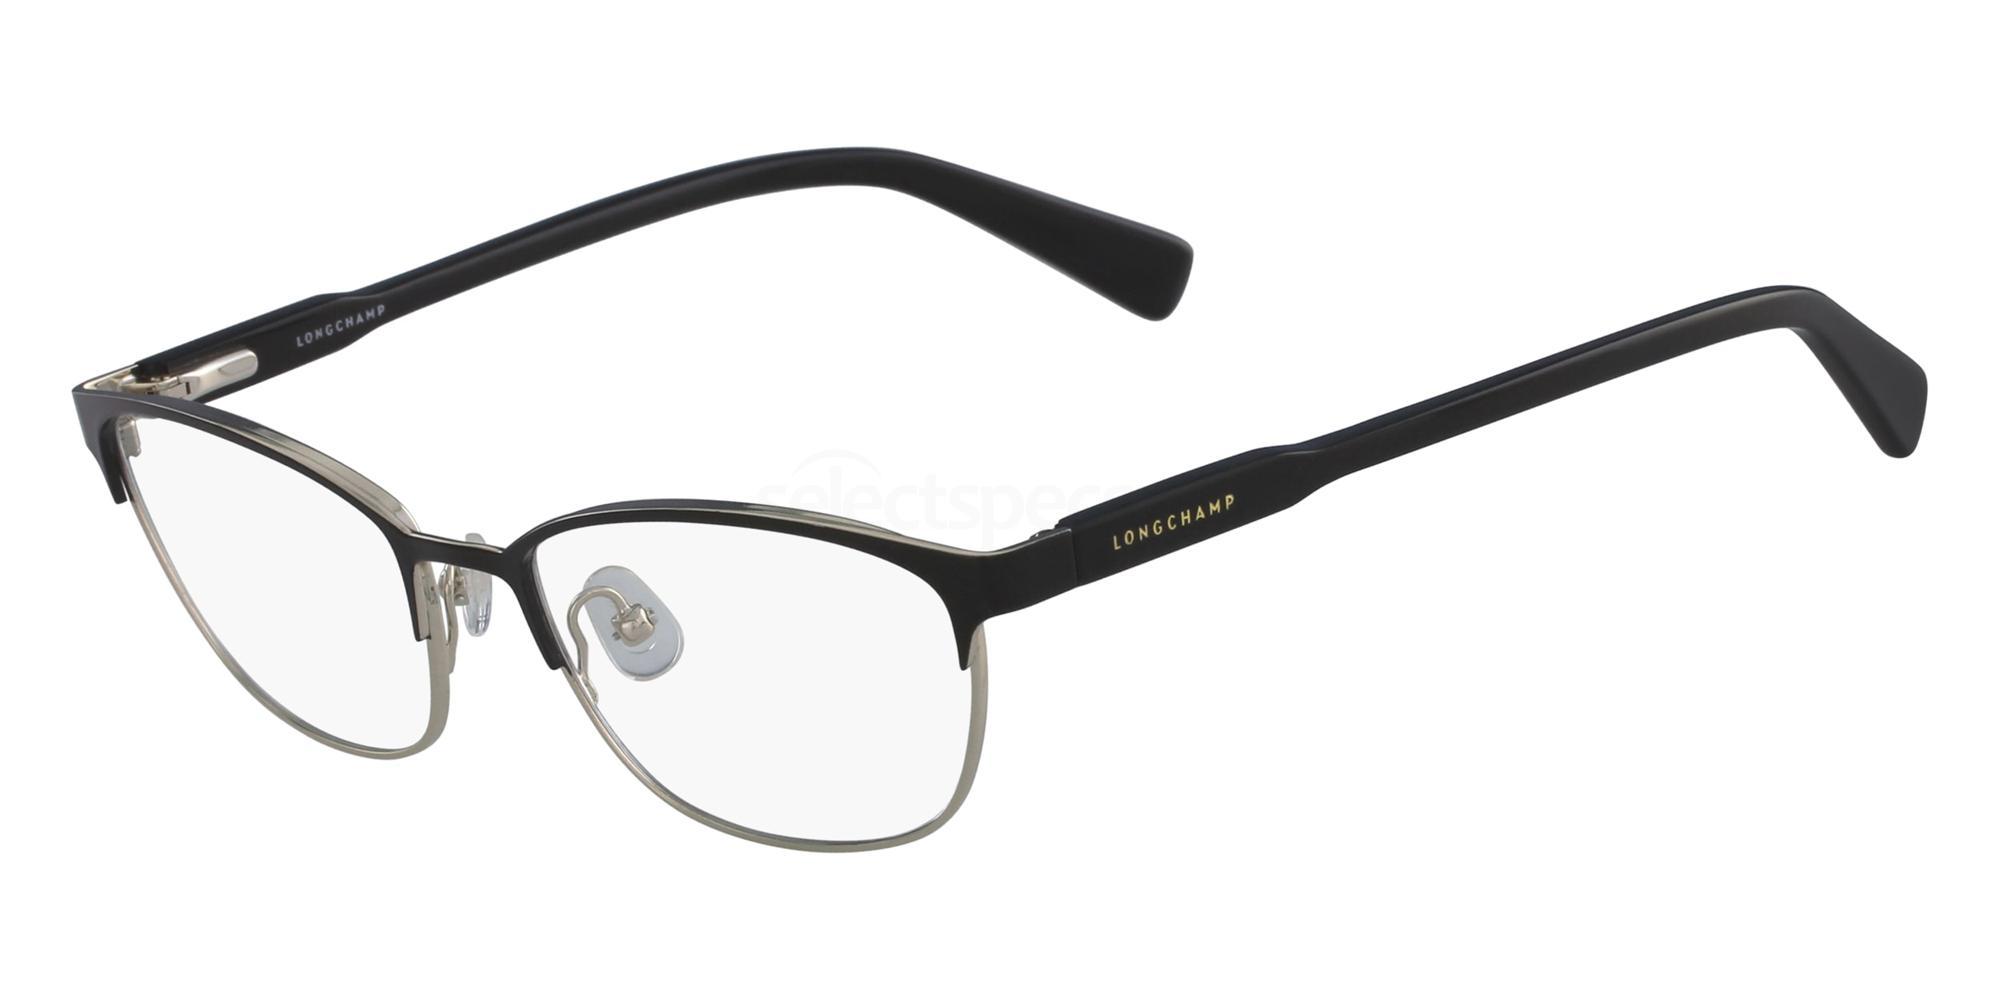 001 LO2107 Glasses, LONGCHAMP